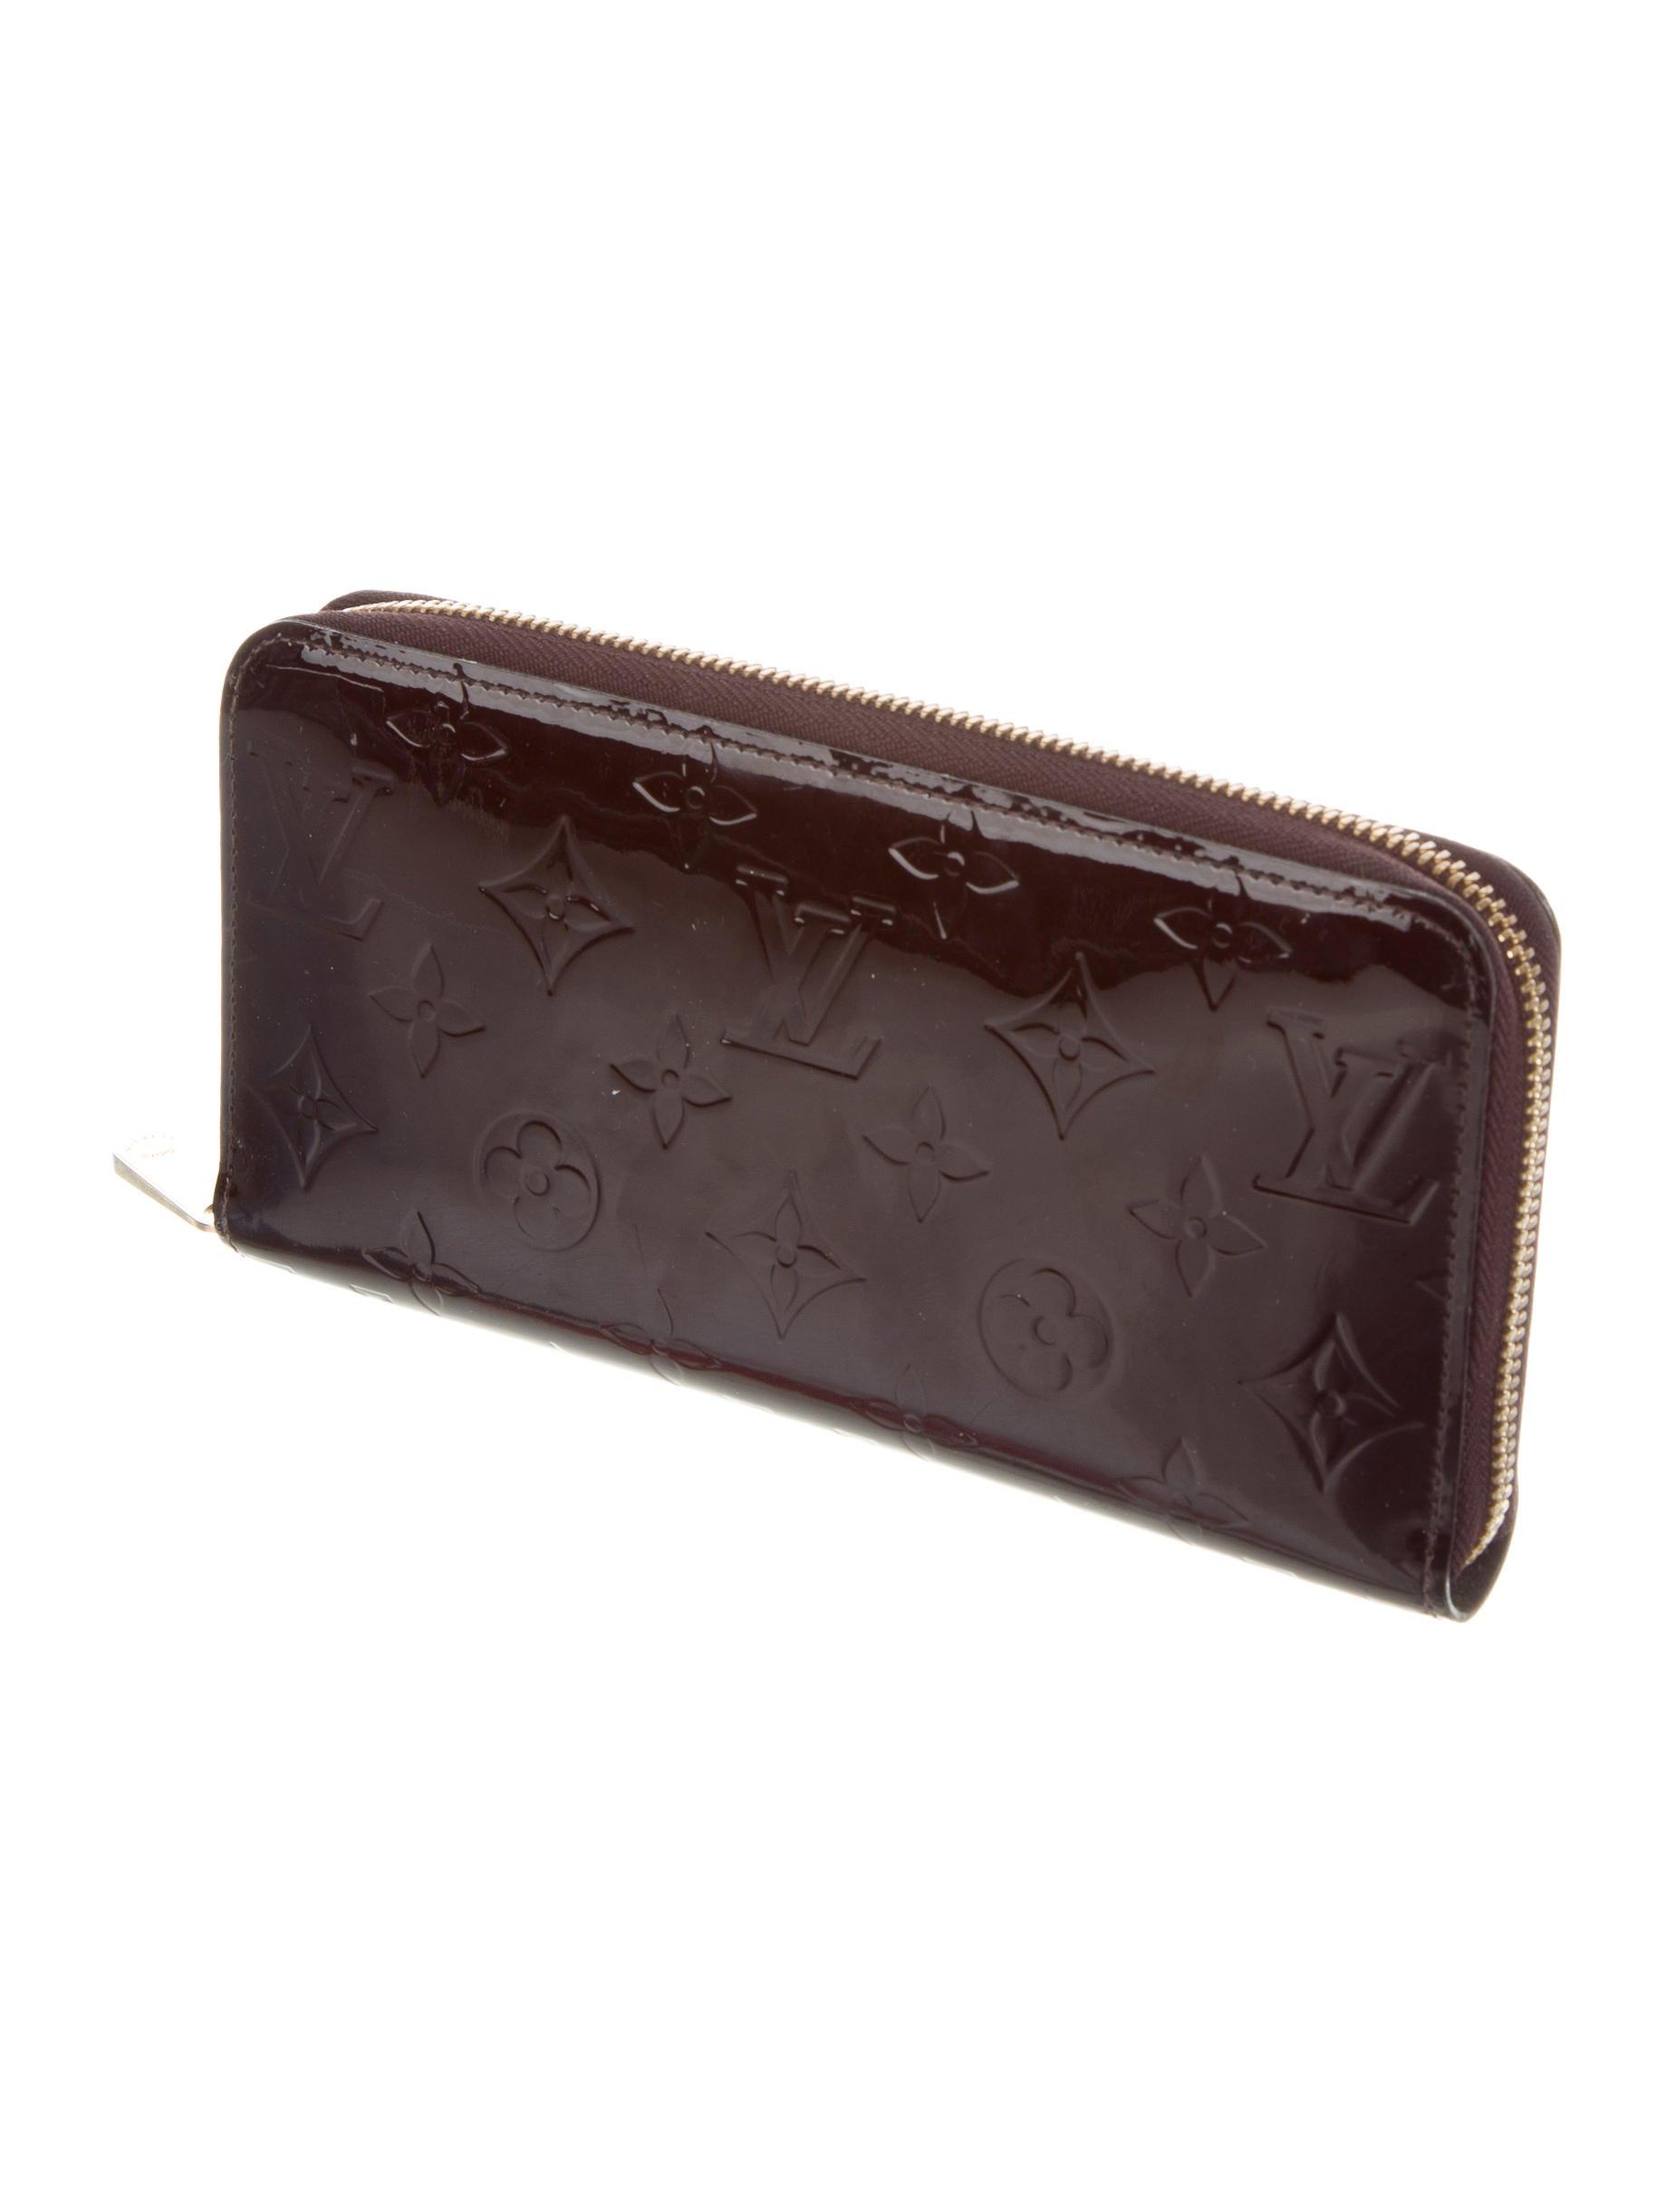 louis vuitton monogram vernis zippy wallet accessories lou127292 the realreal. Black Bedroom Furniture Sets. Home Design Ideas